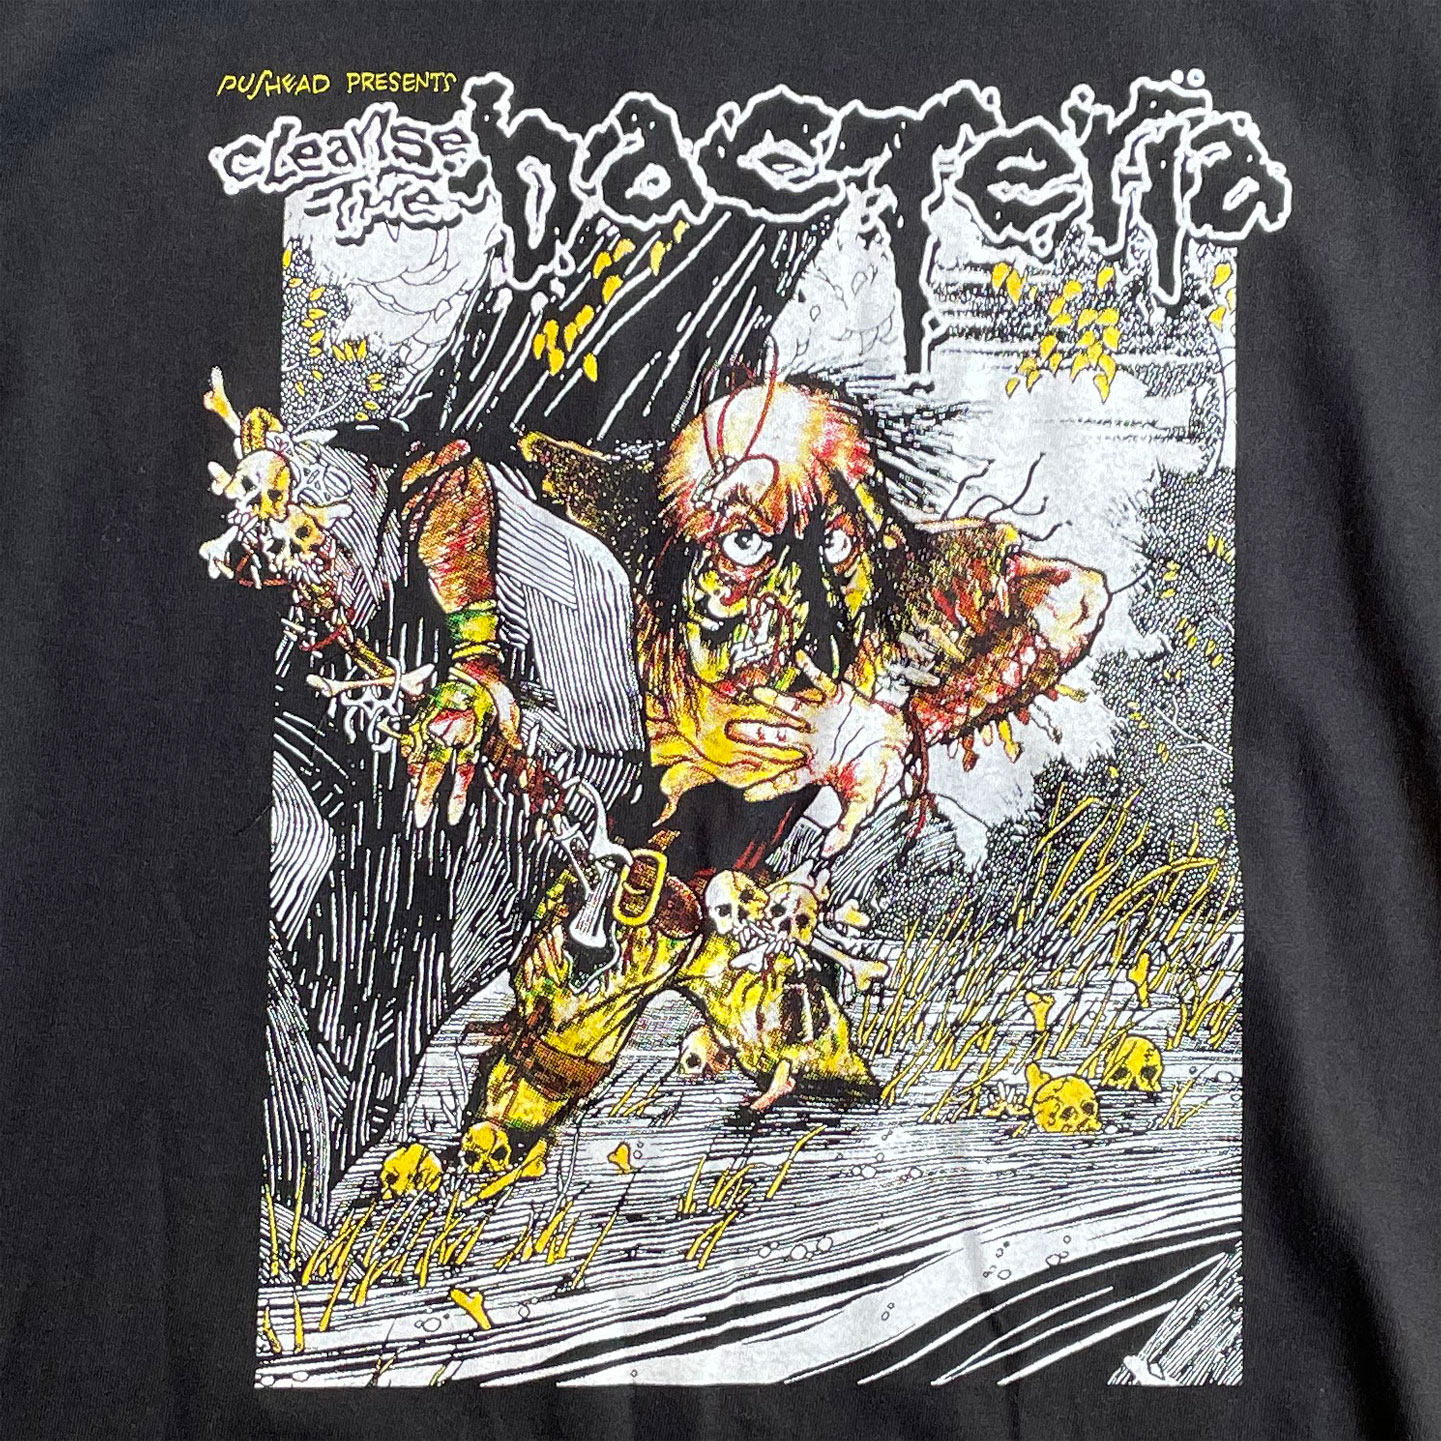 CLEANSE THE BACTERIA ロングスリーブTシャツ